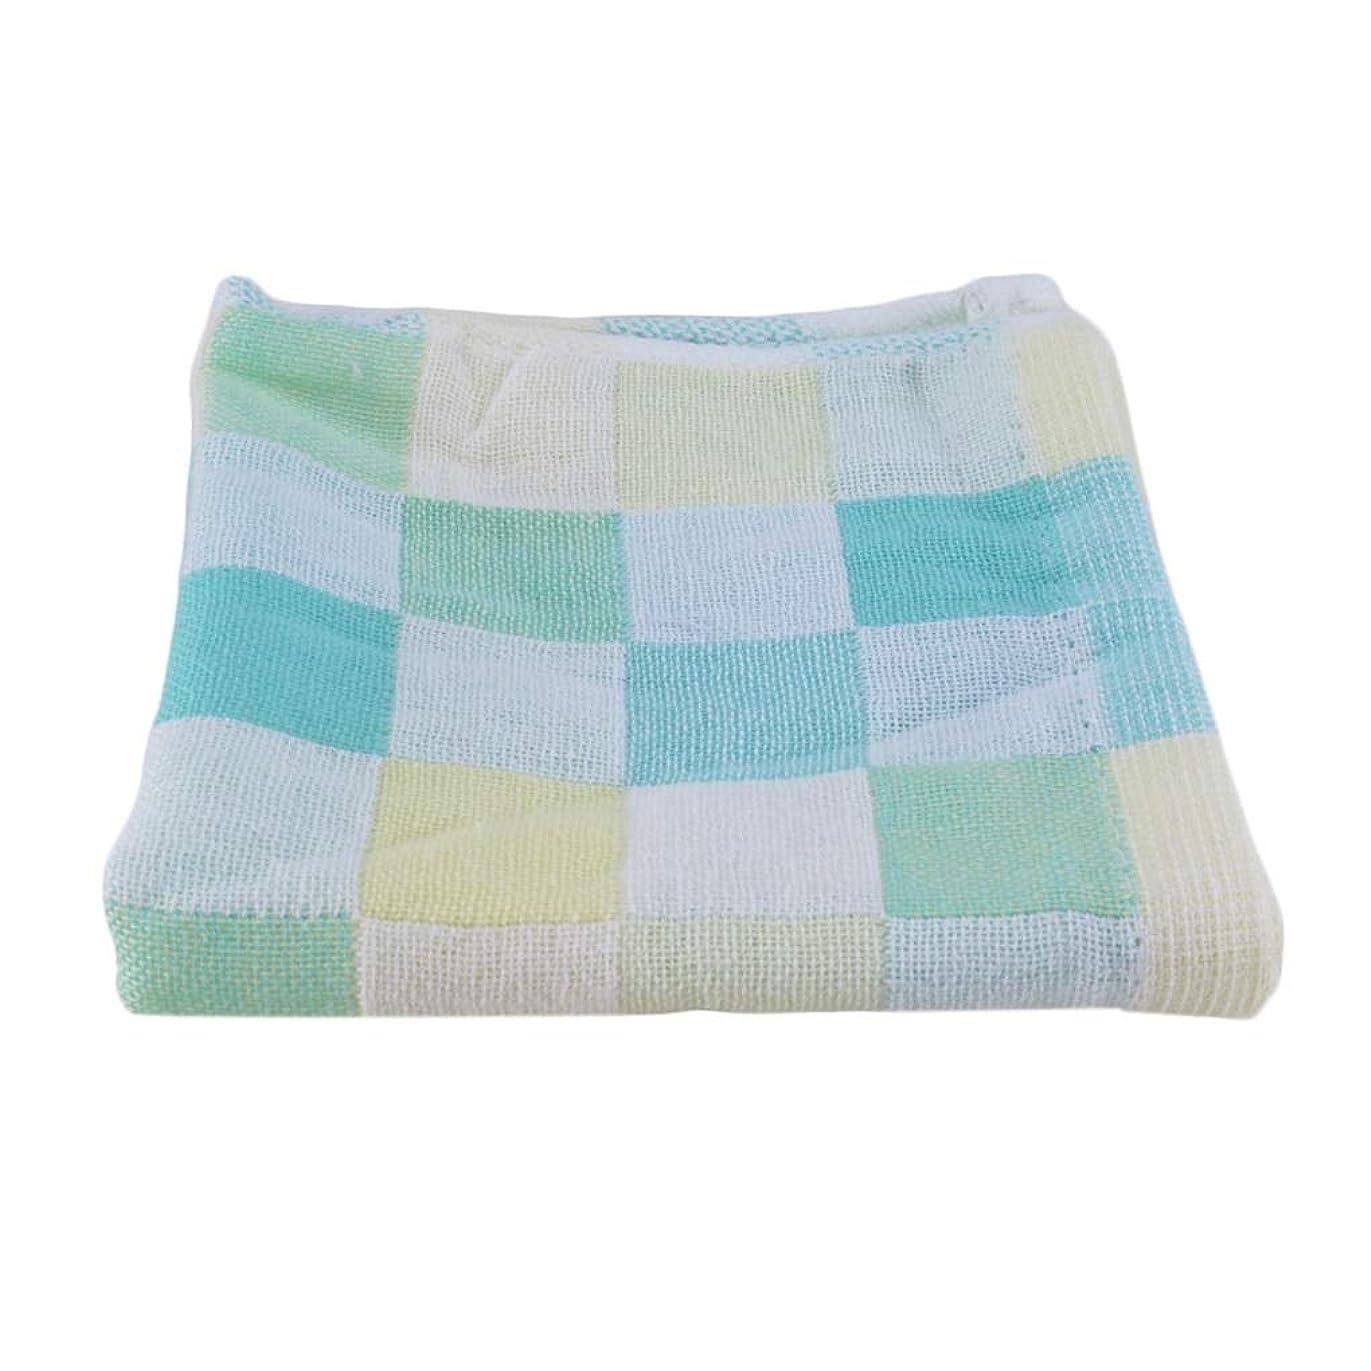 Maxcrestas - 28*28cm Square Towels Cotton gauze Plaid Towel Kids Bibs Daily Use Hand Face Towels for Kids